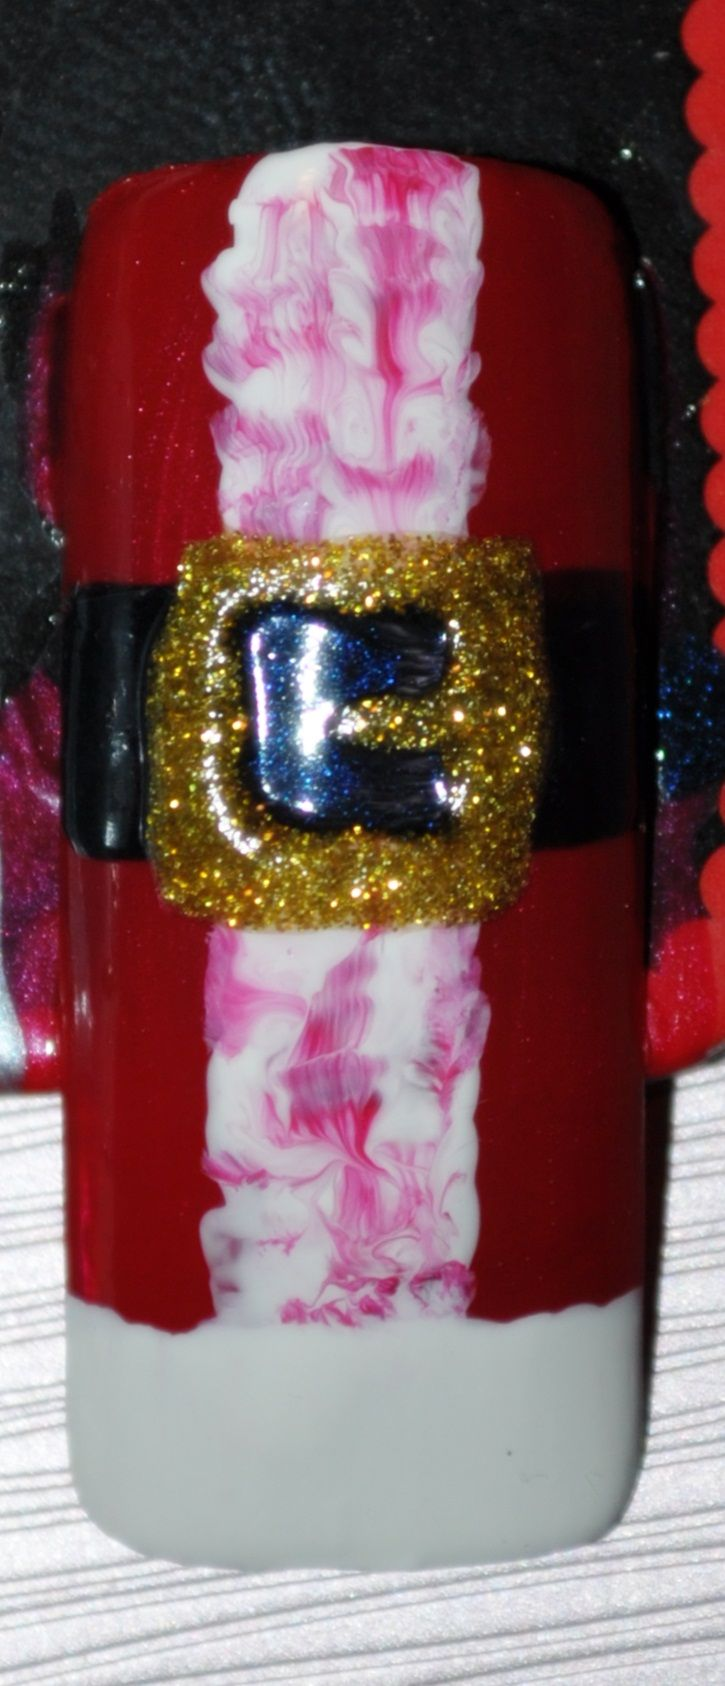 Santa By:Pixie's